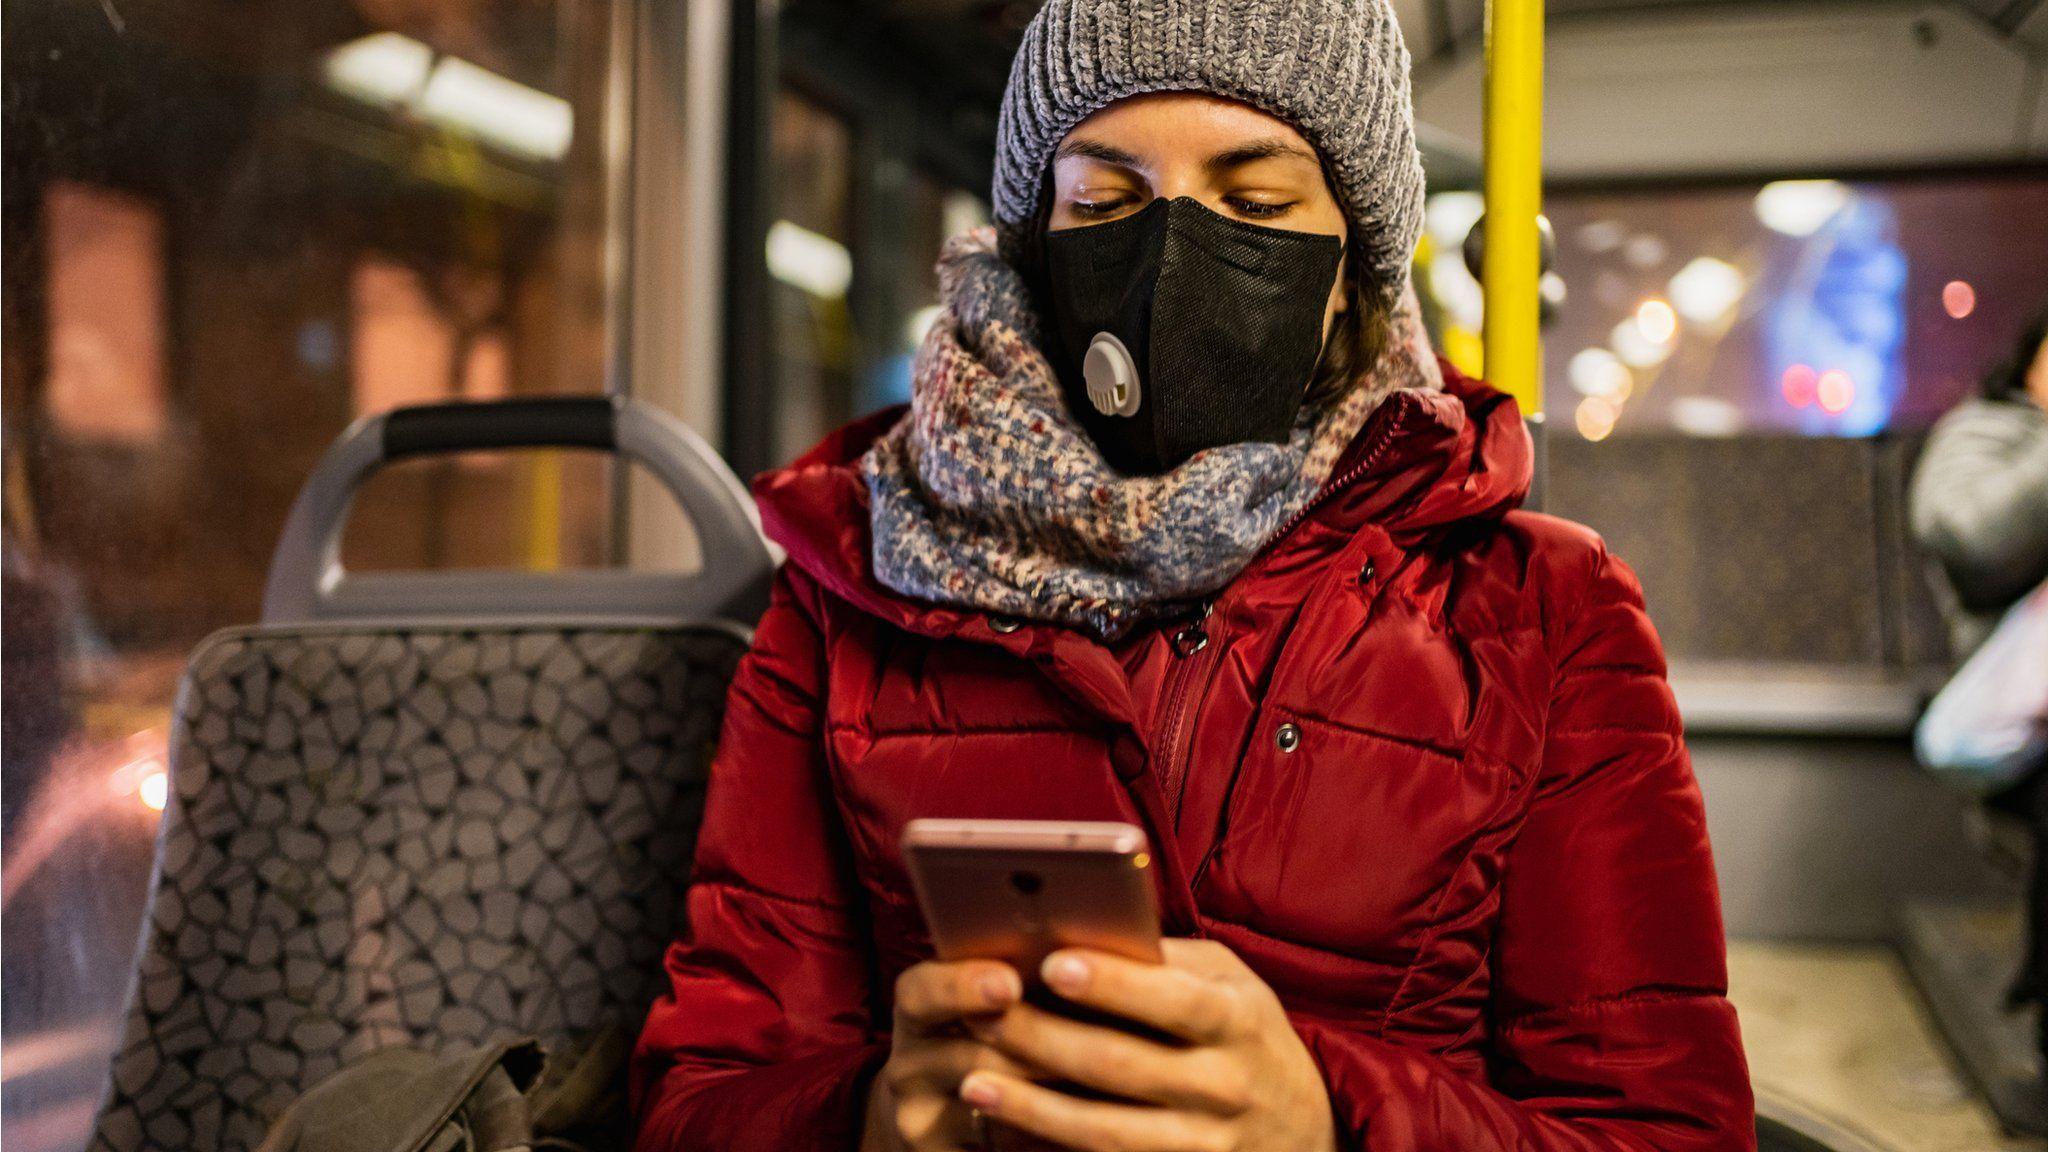 Coronavirus: How bad will winter really be? - BBC News